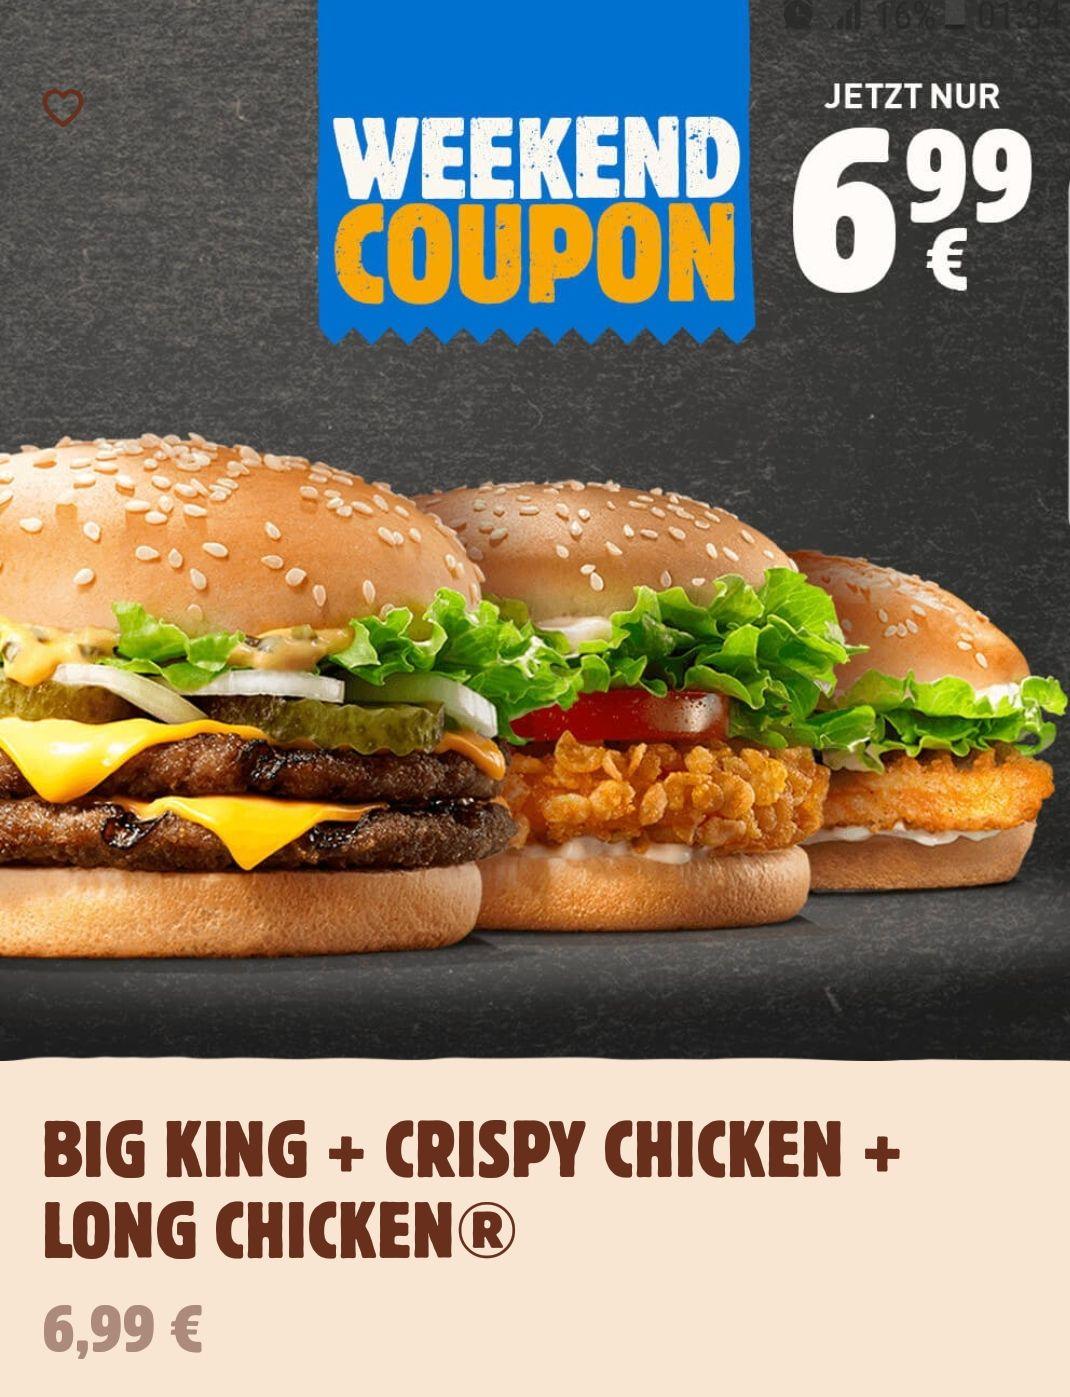 Burger King Weekend Coupon: Big King + Crispy Chicken + Long Chicken für 6,99€